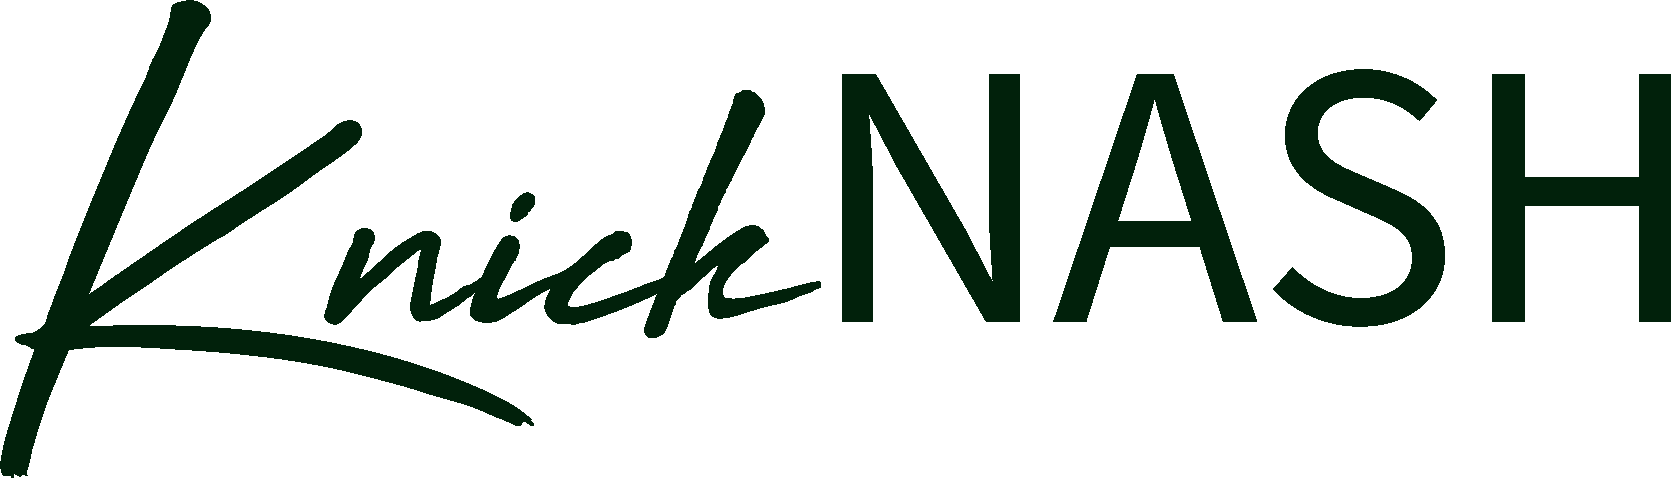 Knick NASH Logo